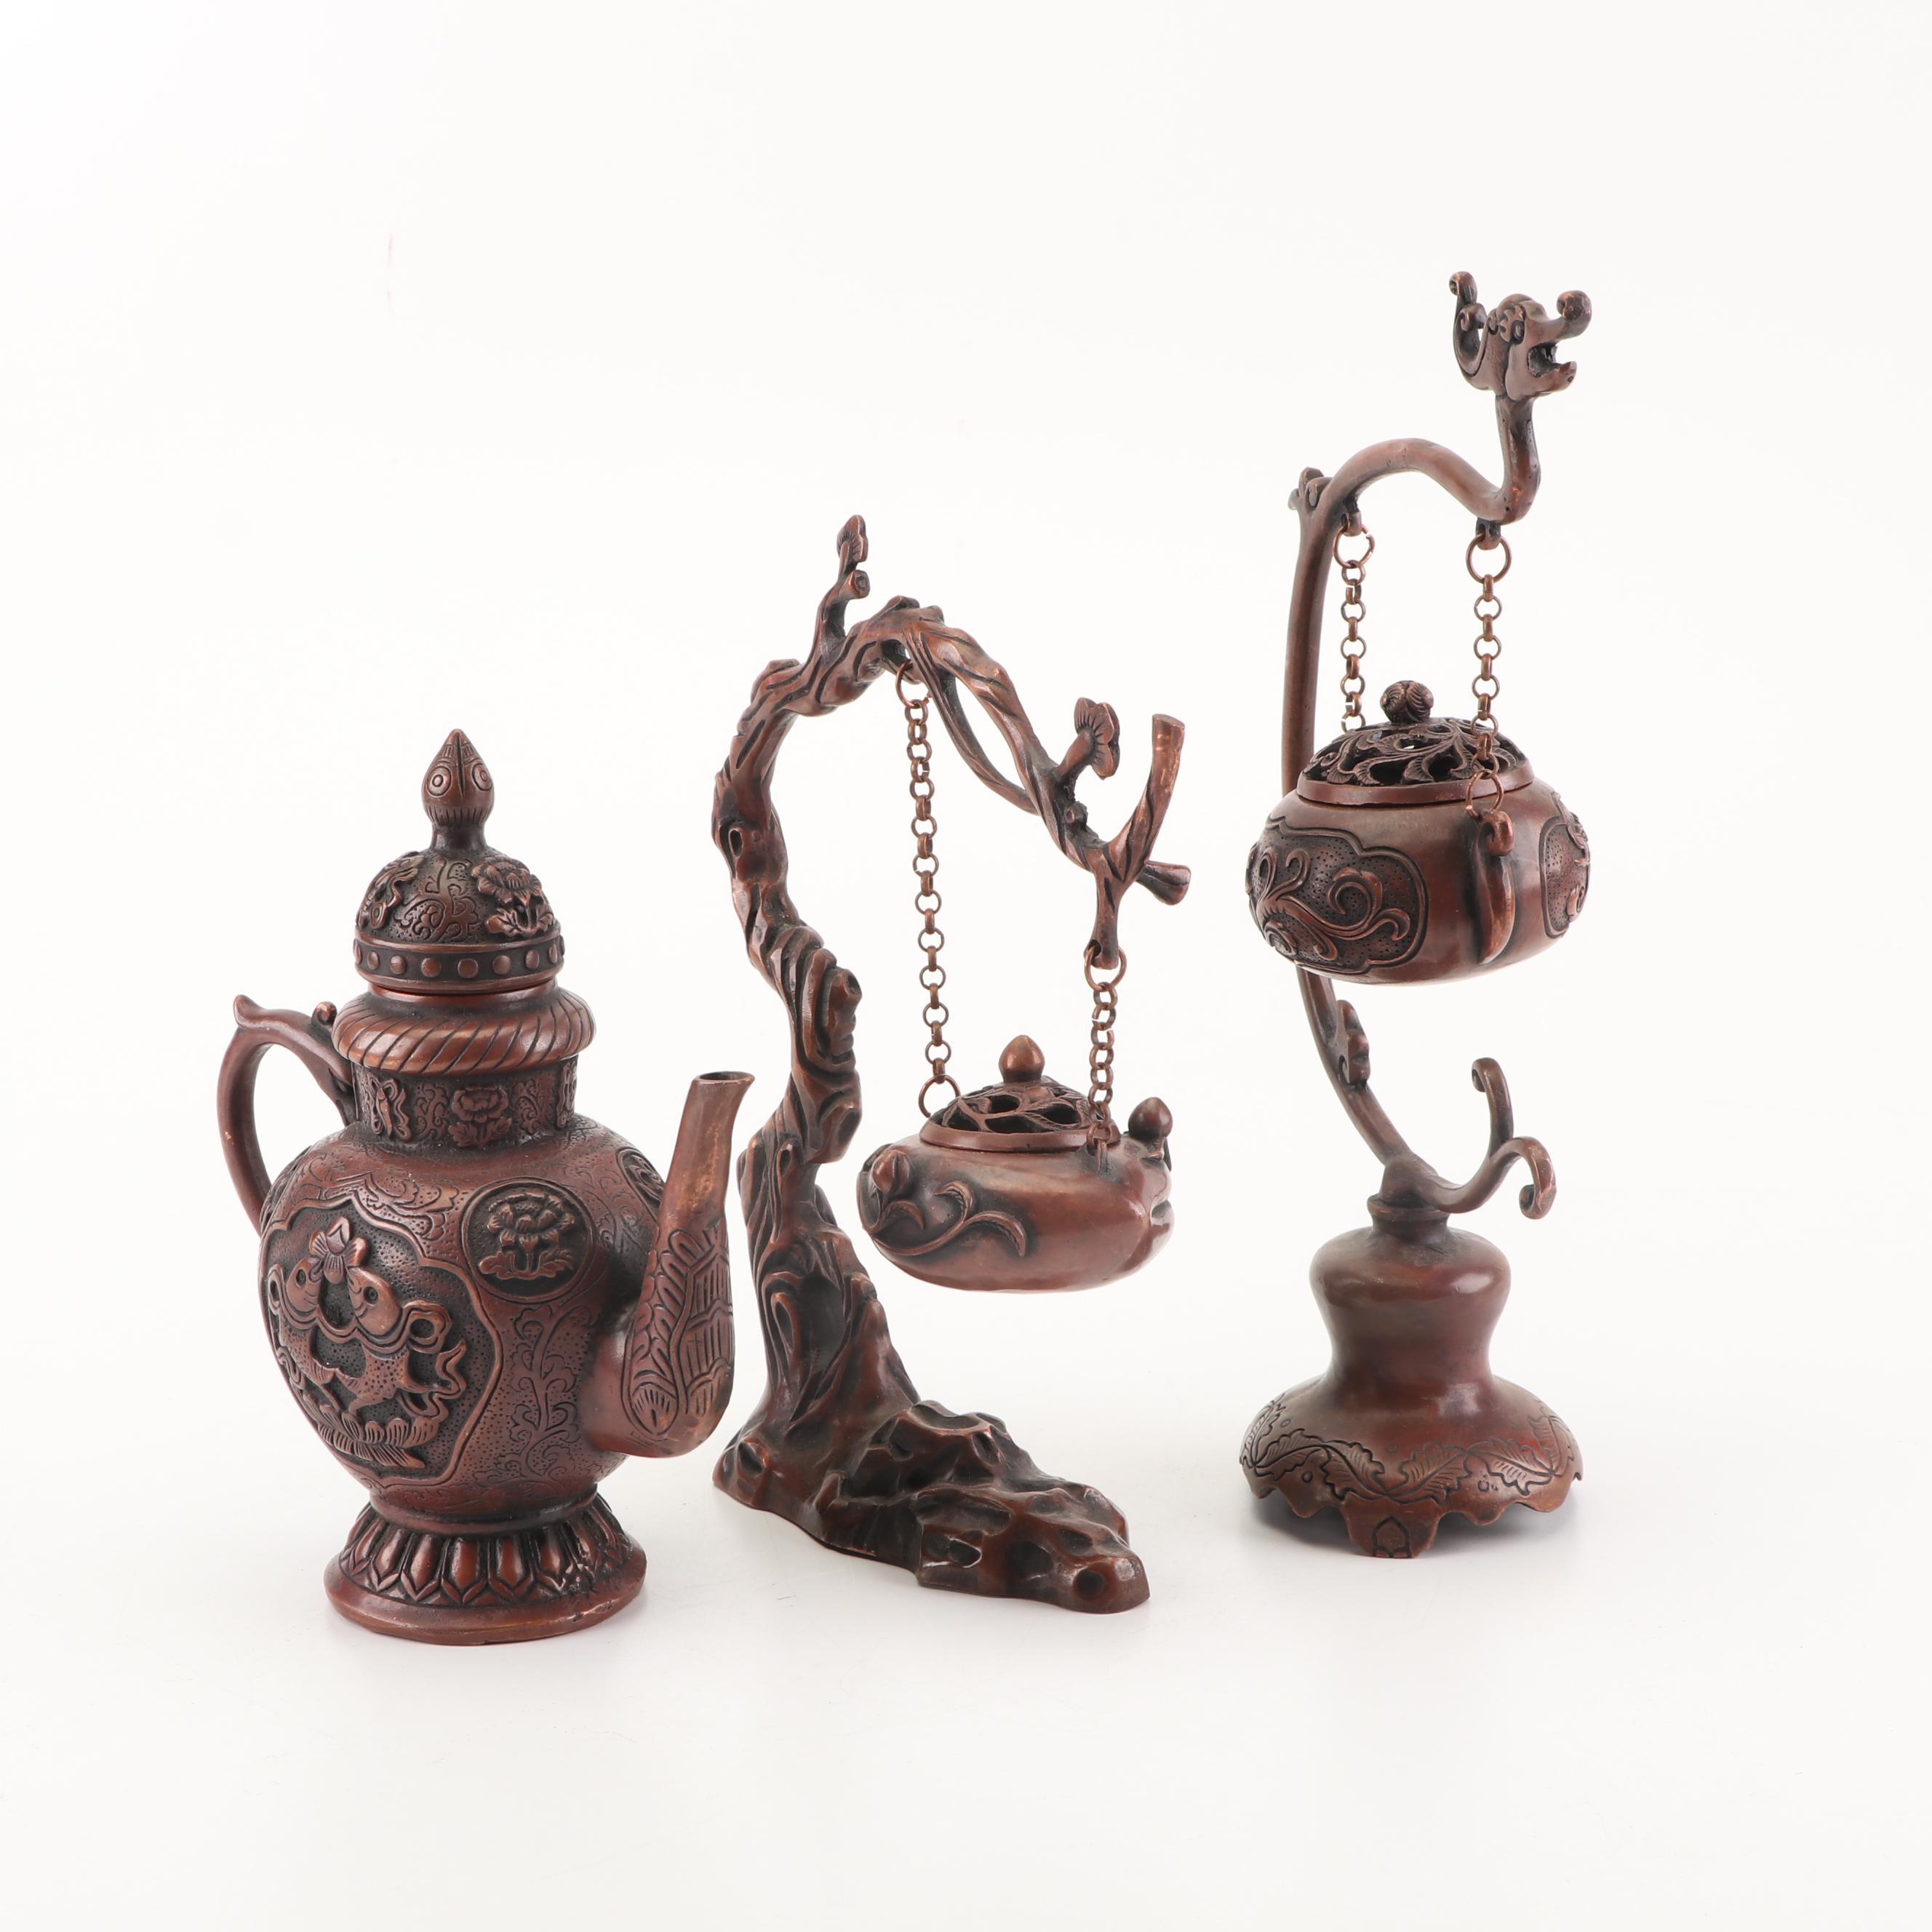 Chinese Decorative Metal Teapot and Hanging Incense Burners